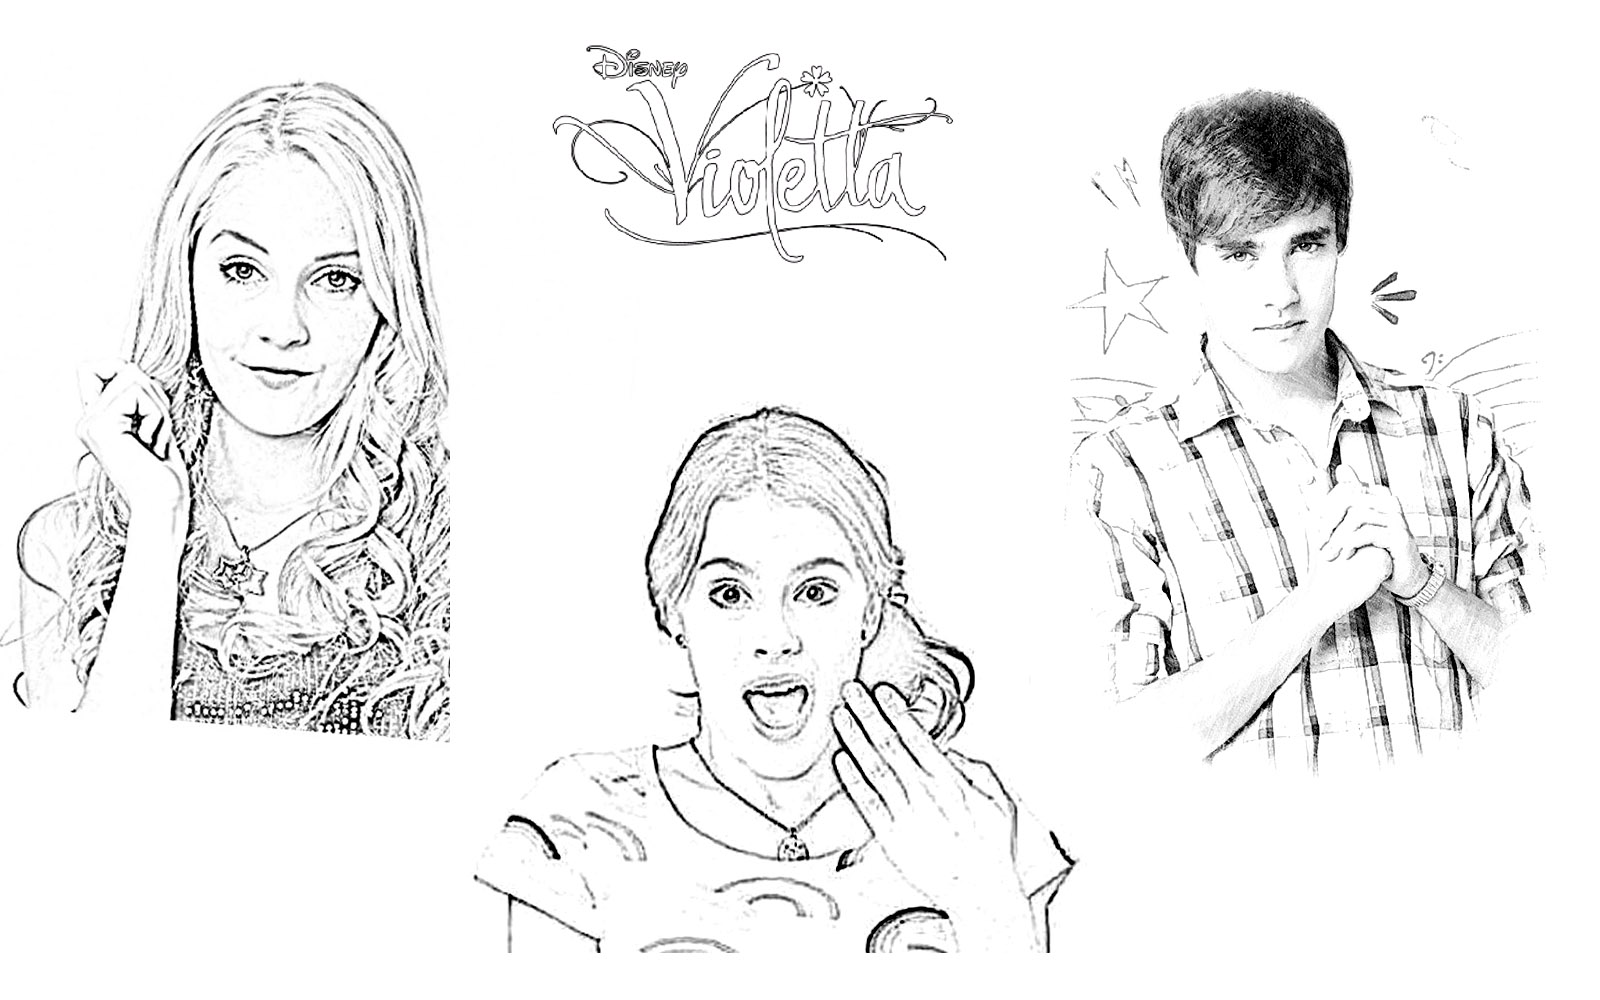 Dibujos Sin Colorear Dibujos De Violetta Disney Para: Desenhos Para Colorir E Imprimir: Desenhos Para Colorir Da